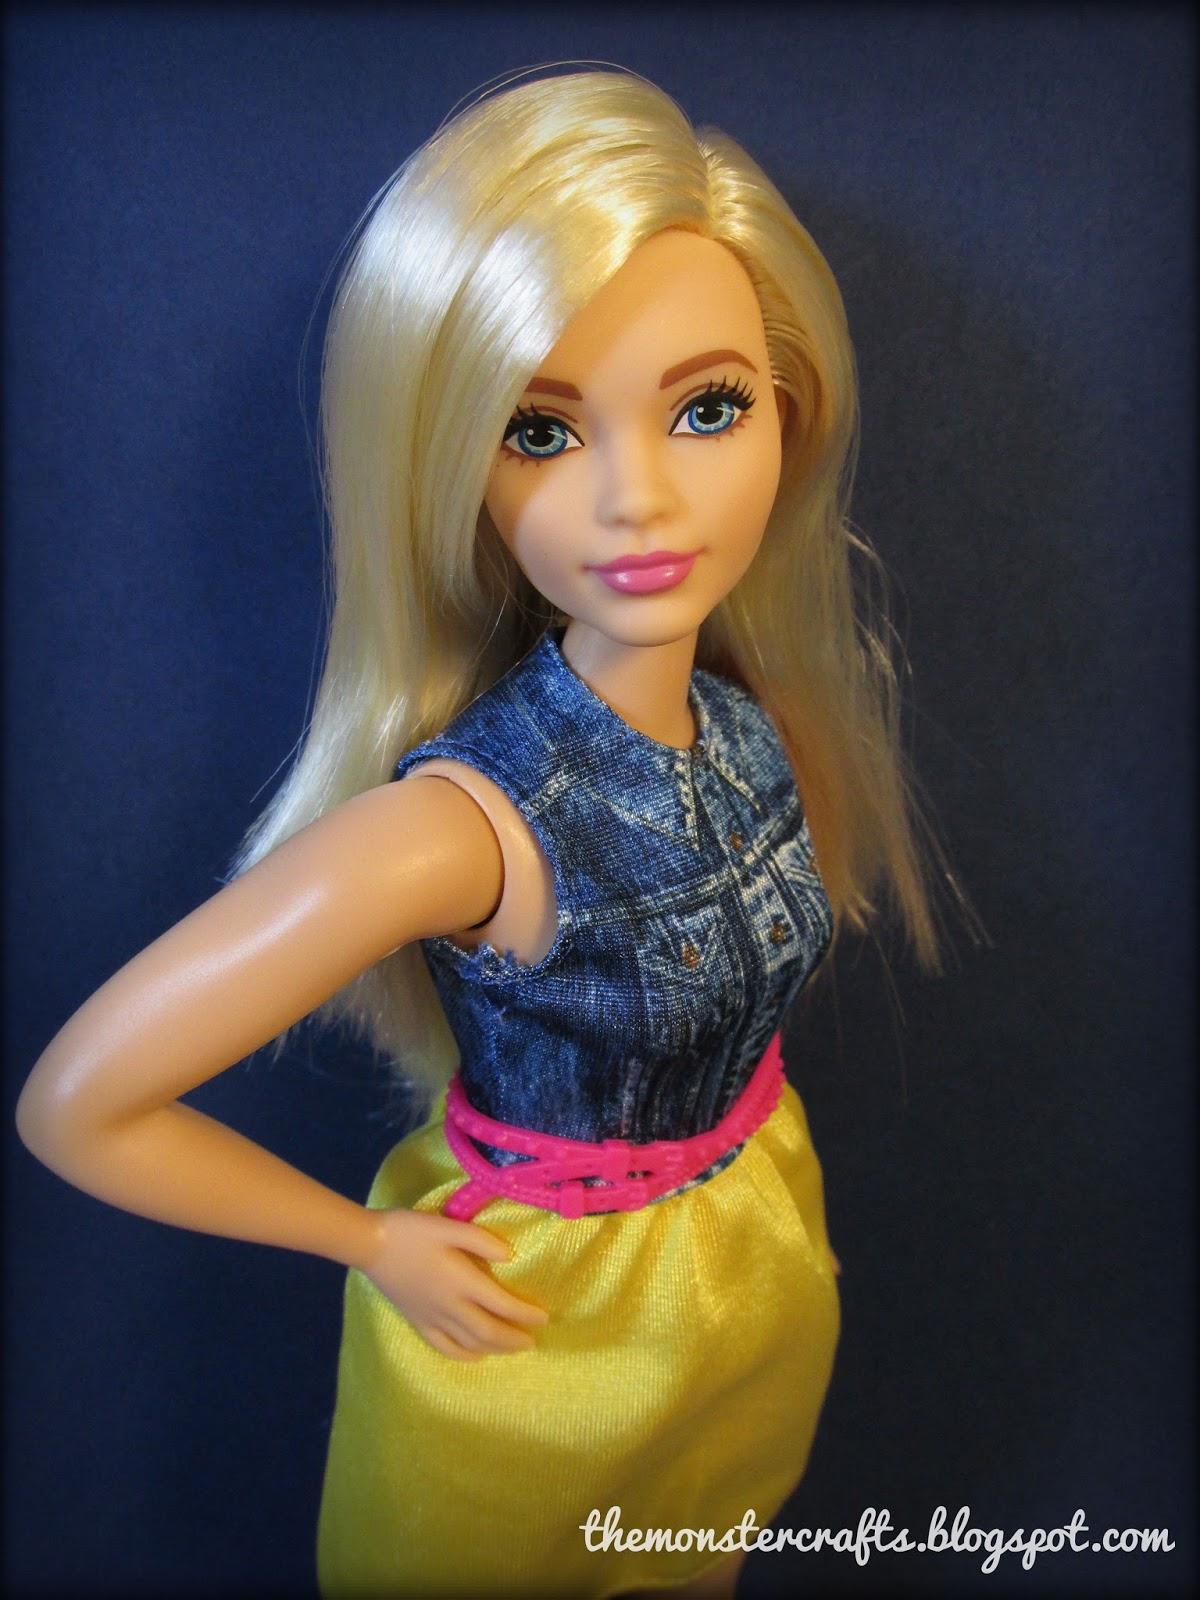 The Fashionomist The Hemline Index: Monster Crafts: Doll Review: Barbie Fashionistas Curvy